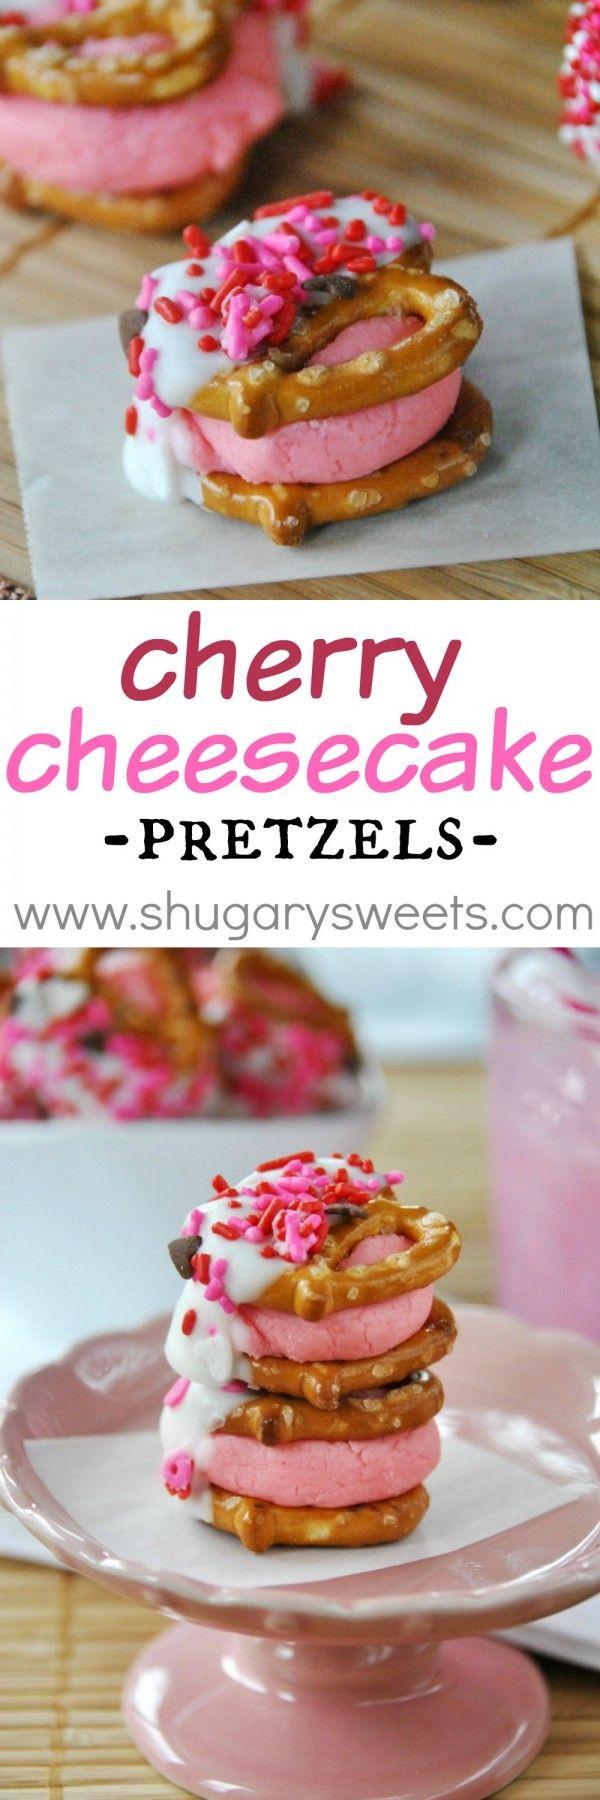 Cherry Cheesecake Pretzel Bites delicious, easy bite